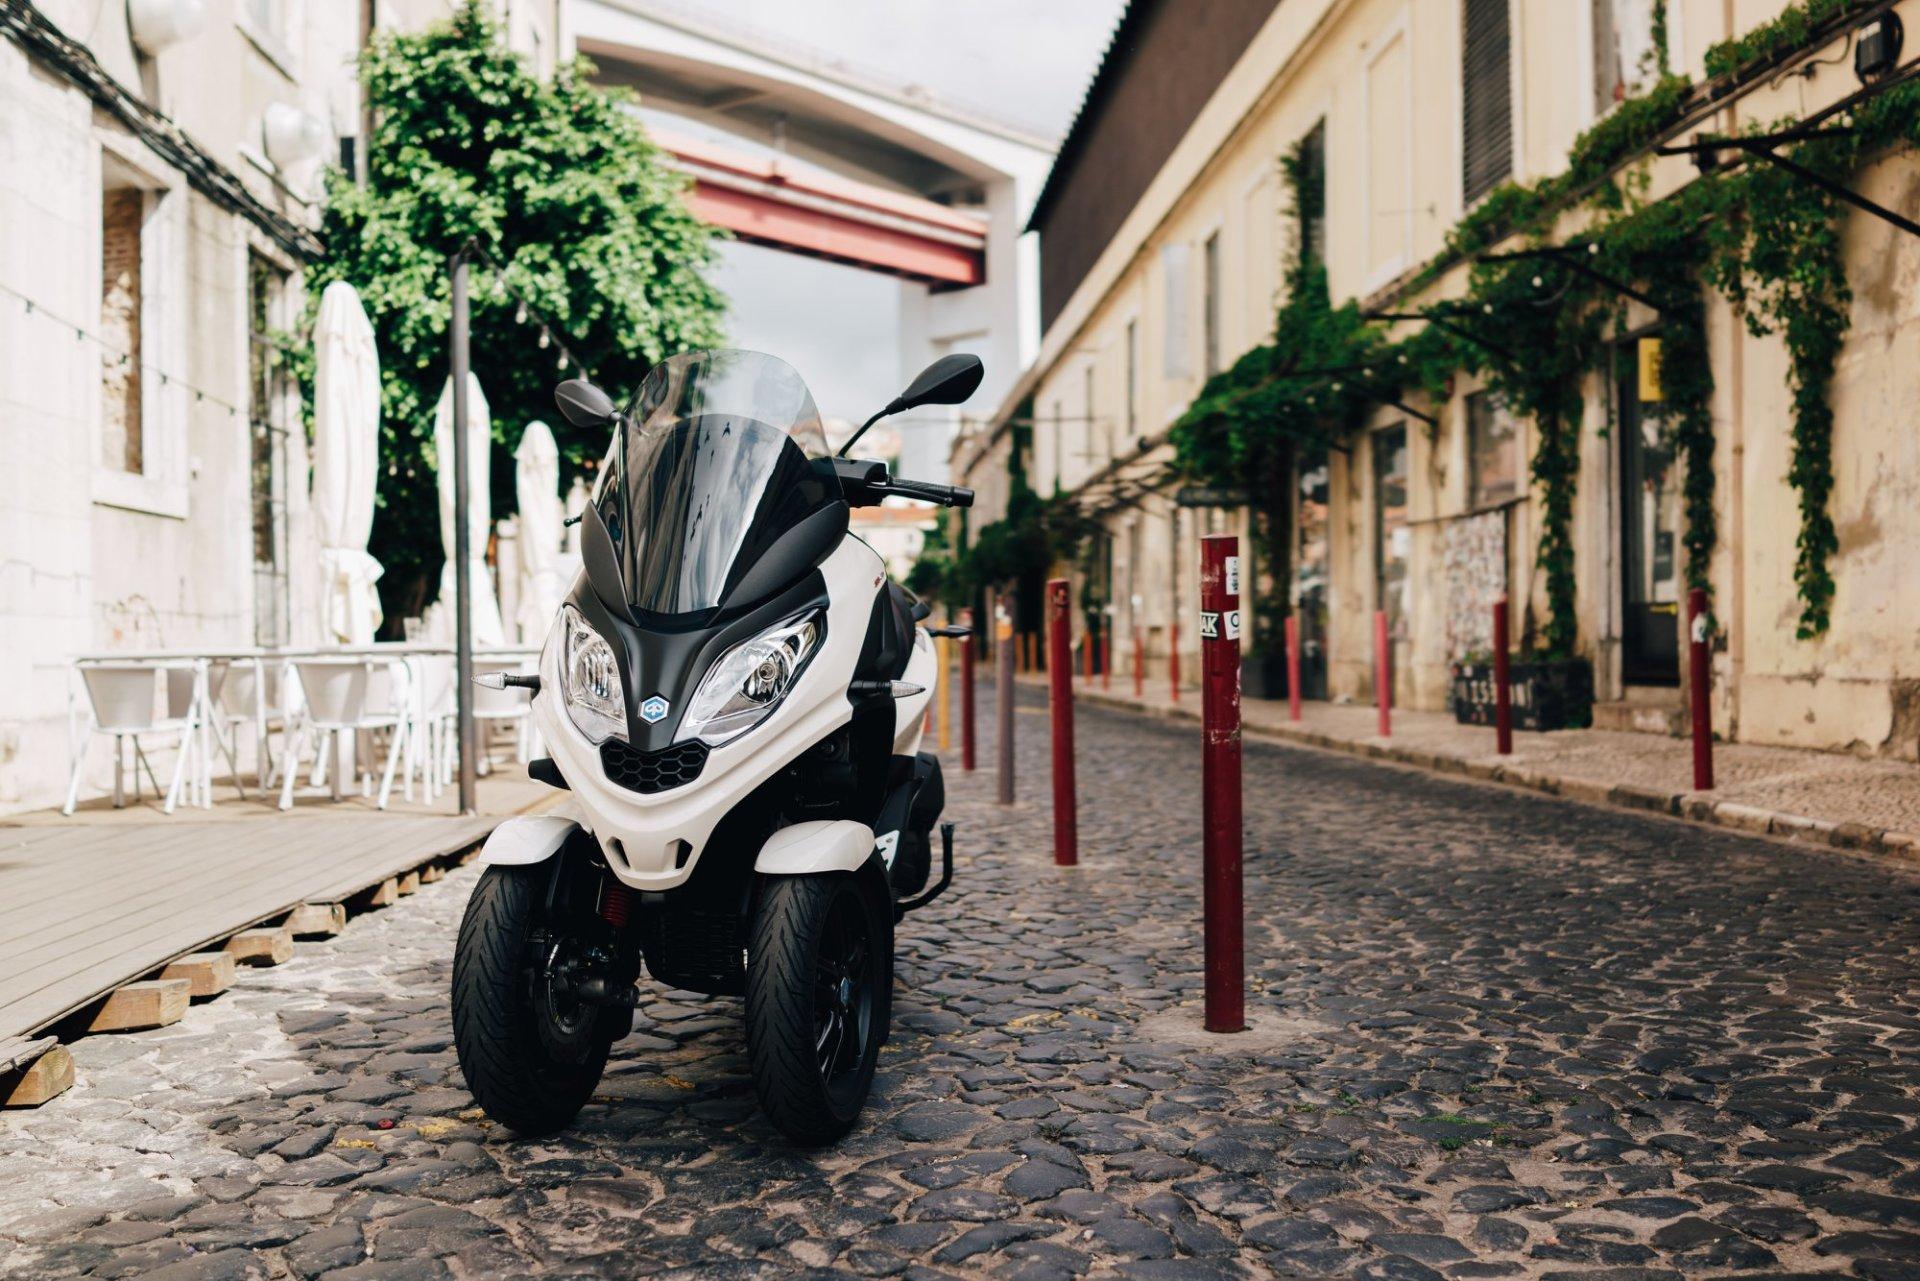 Piaggio Mp3 Scooter 3 Ruedas 01